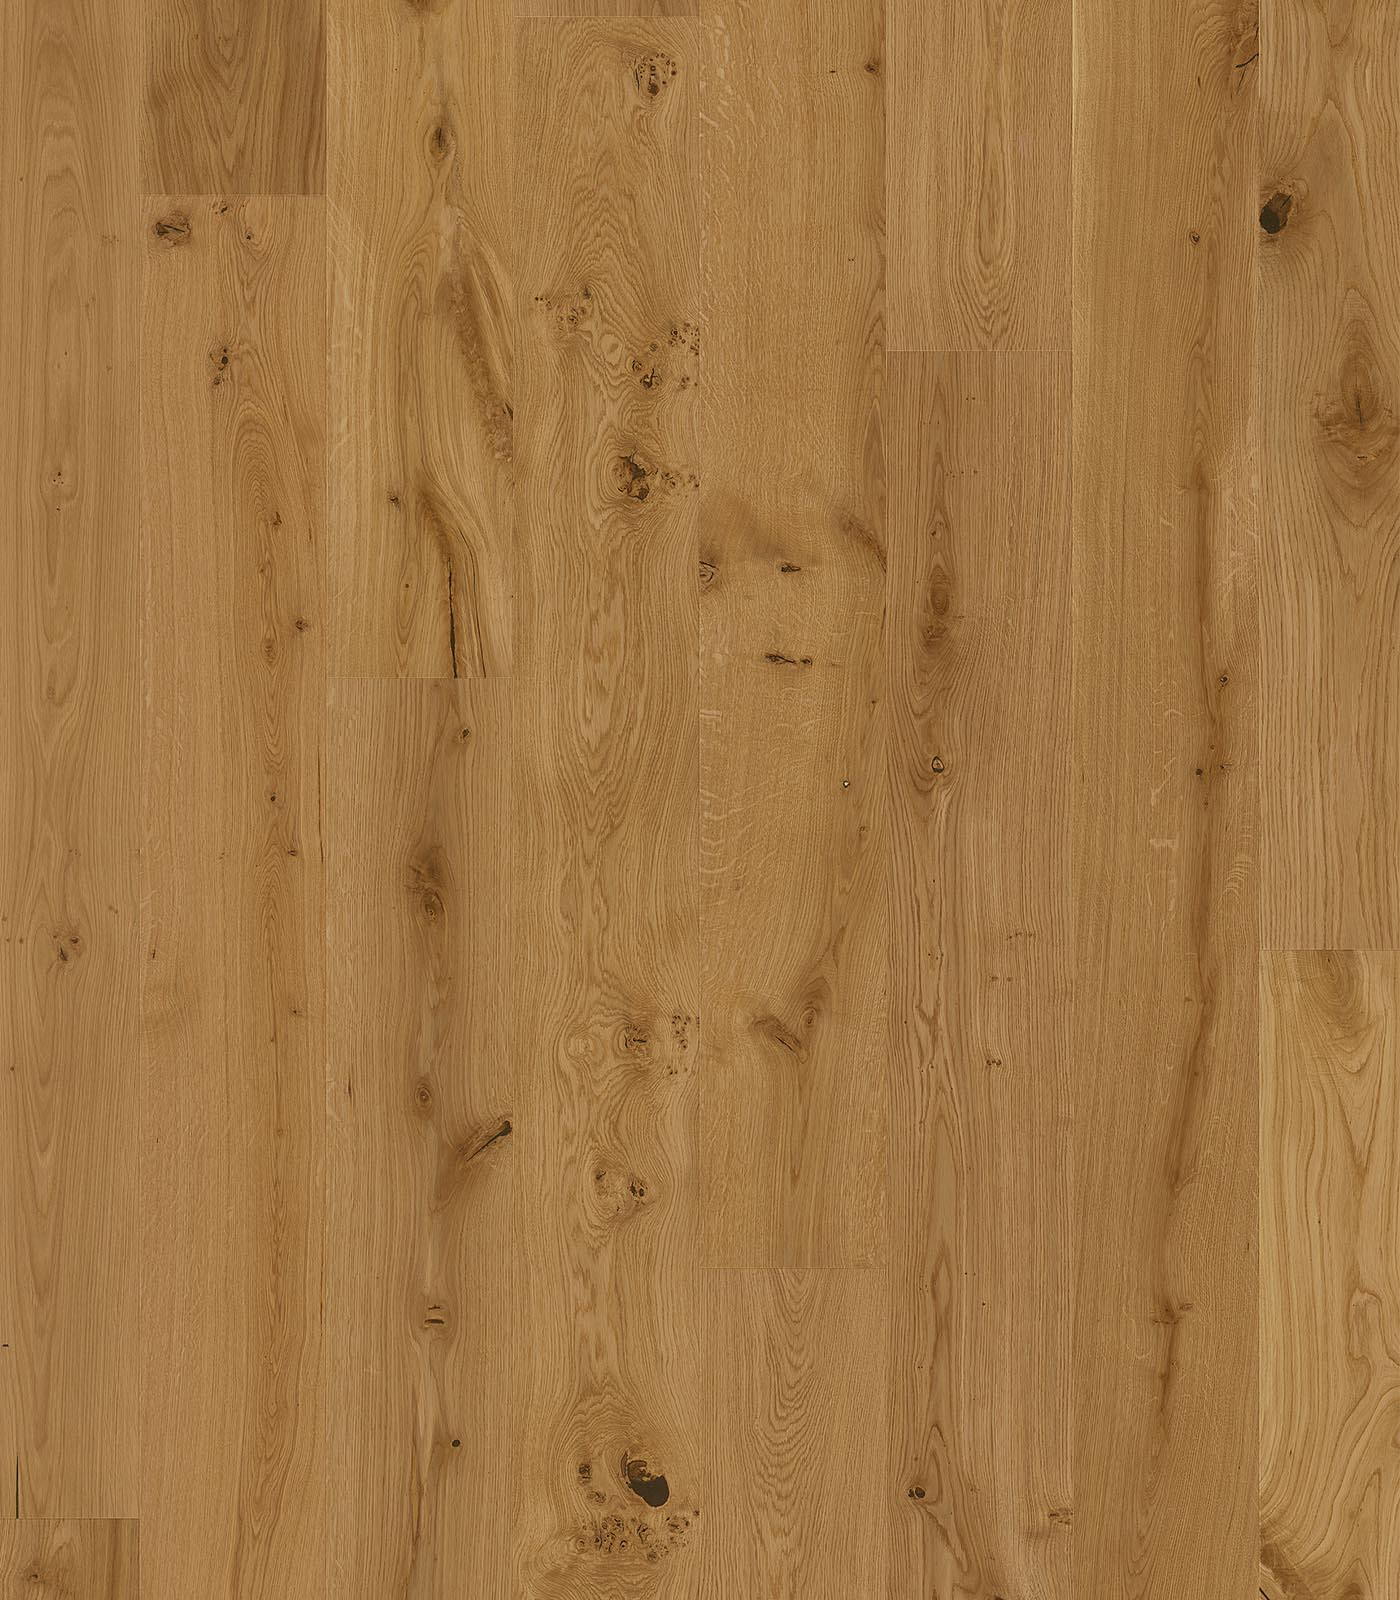 Lifestyle-European-Oak-grading-floors-flat